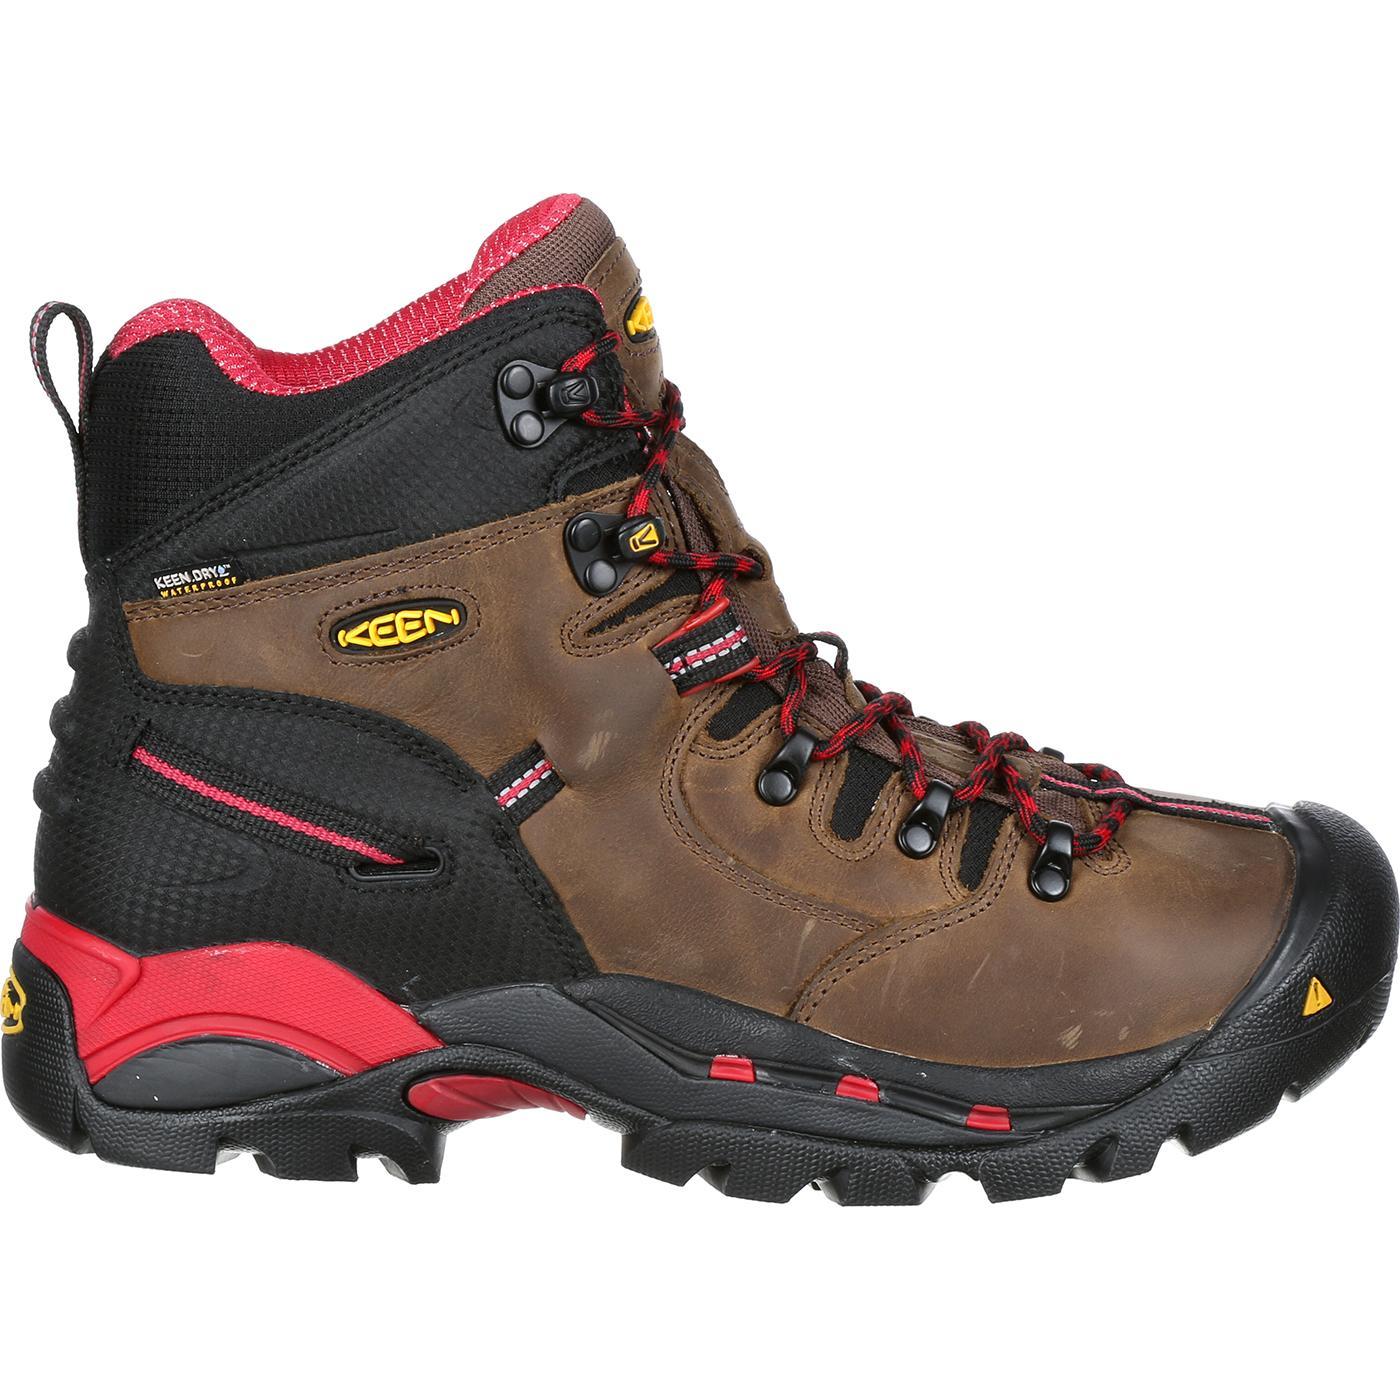 Keen Mens Shoe Waterproof